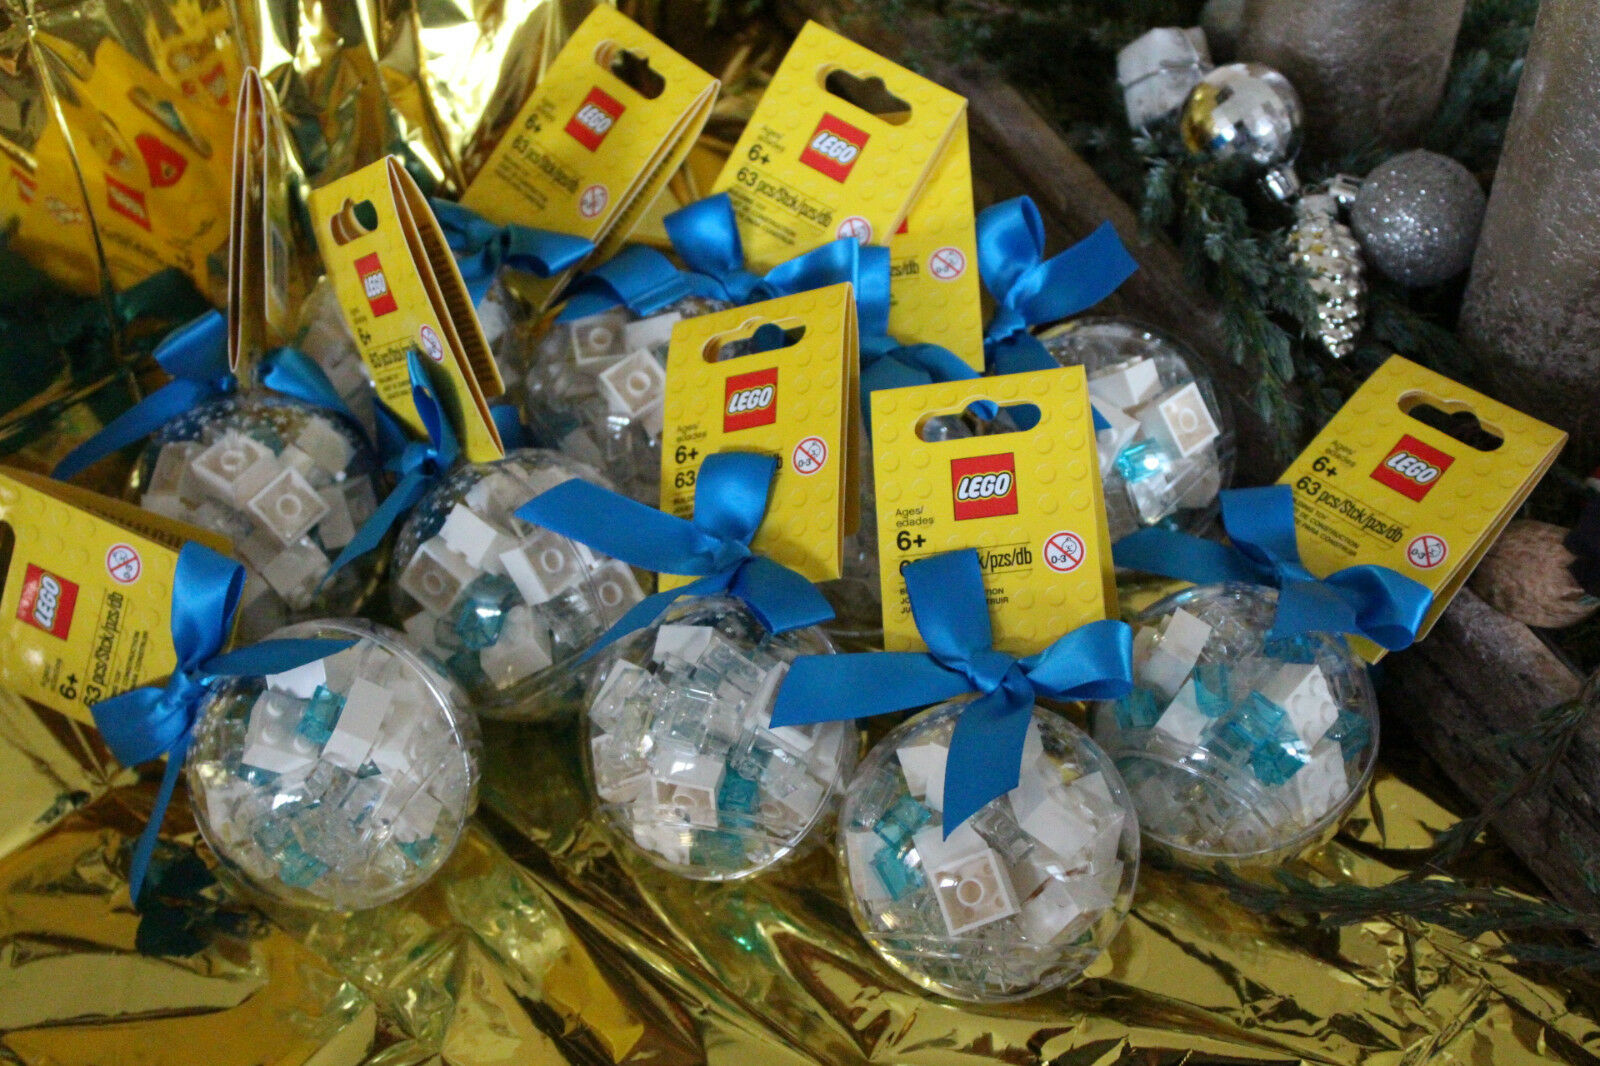 10x Lego 851358 Christmas Tree Ball Christmas Bauble blanc-bleu Transparent nouveau & OVP